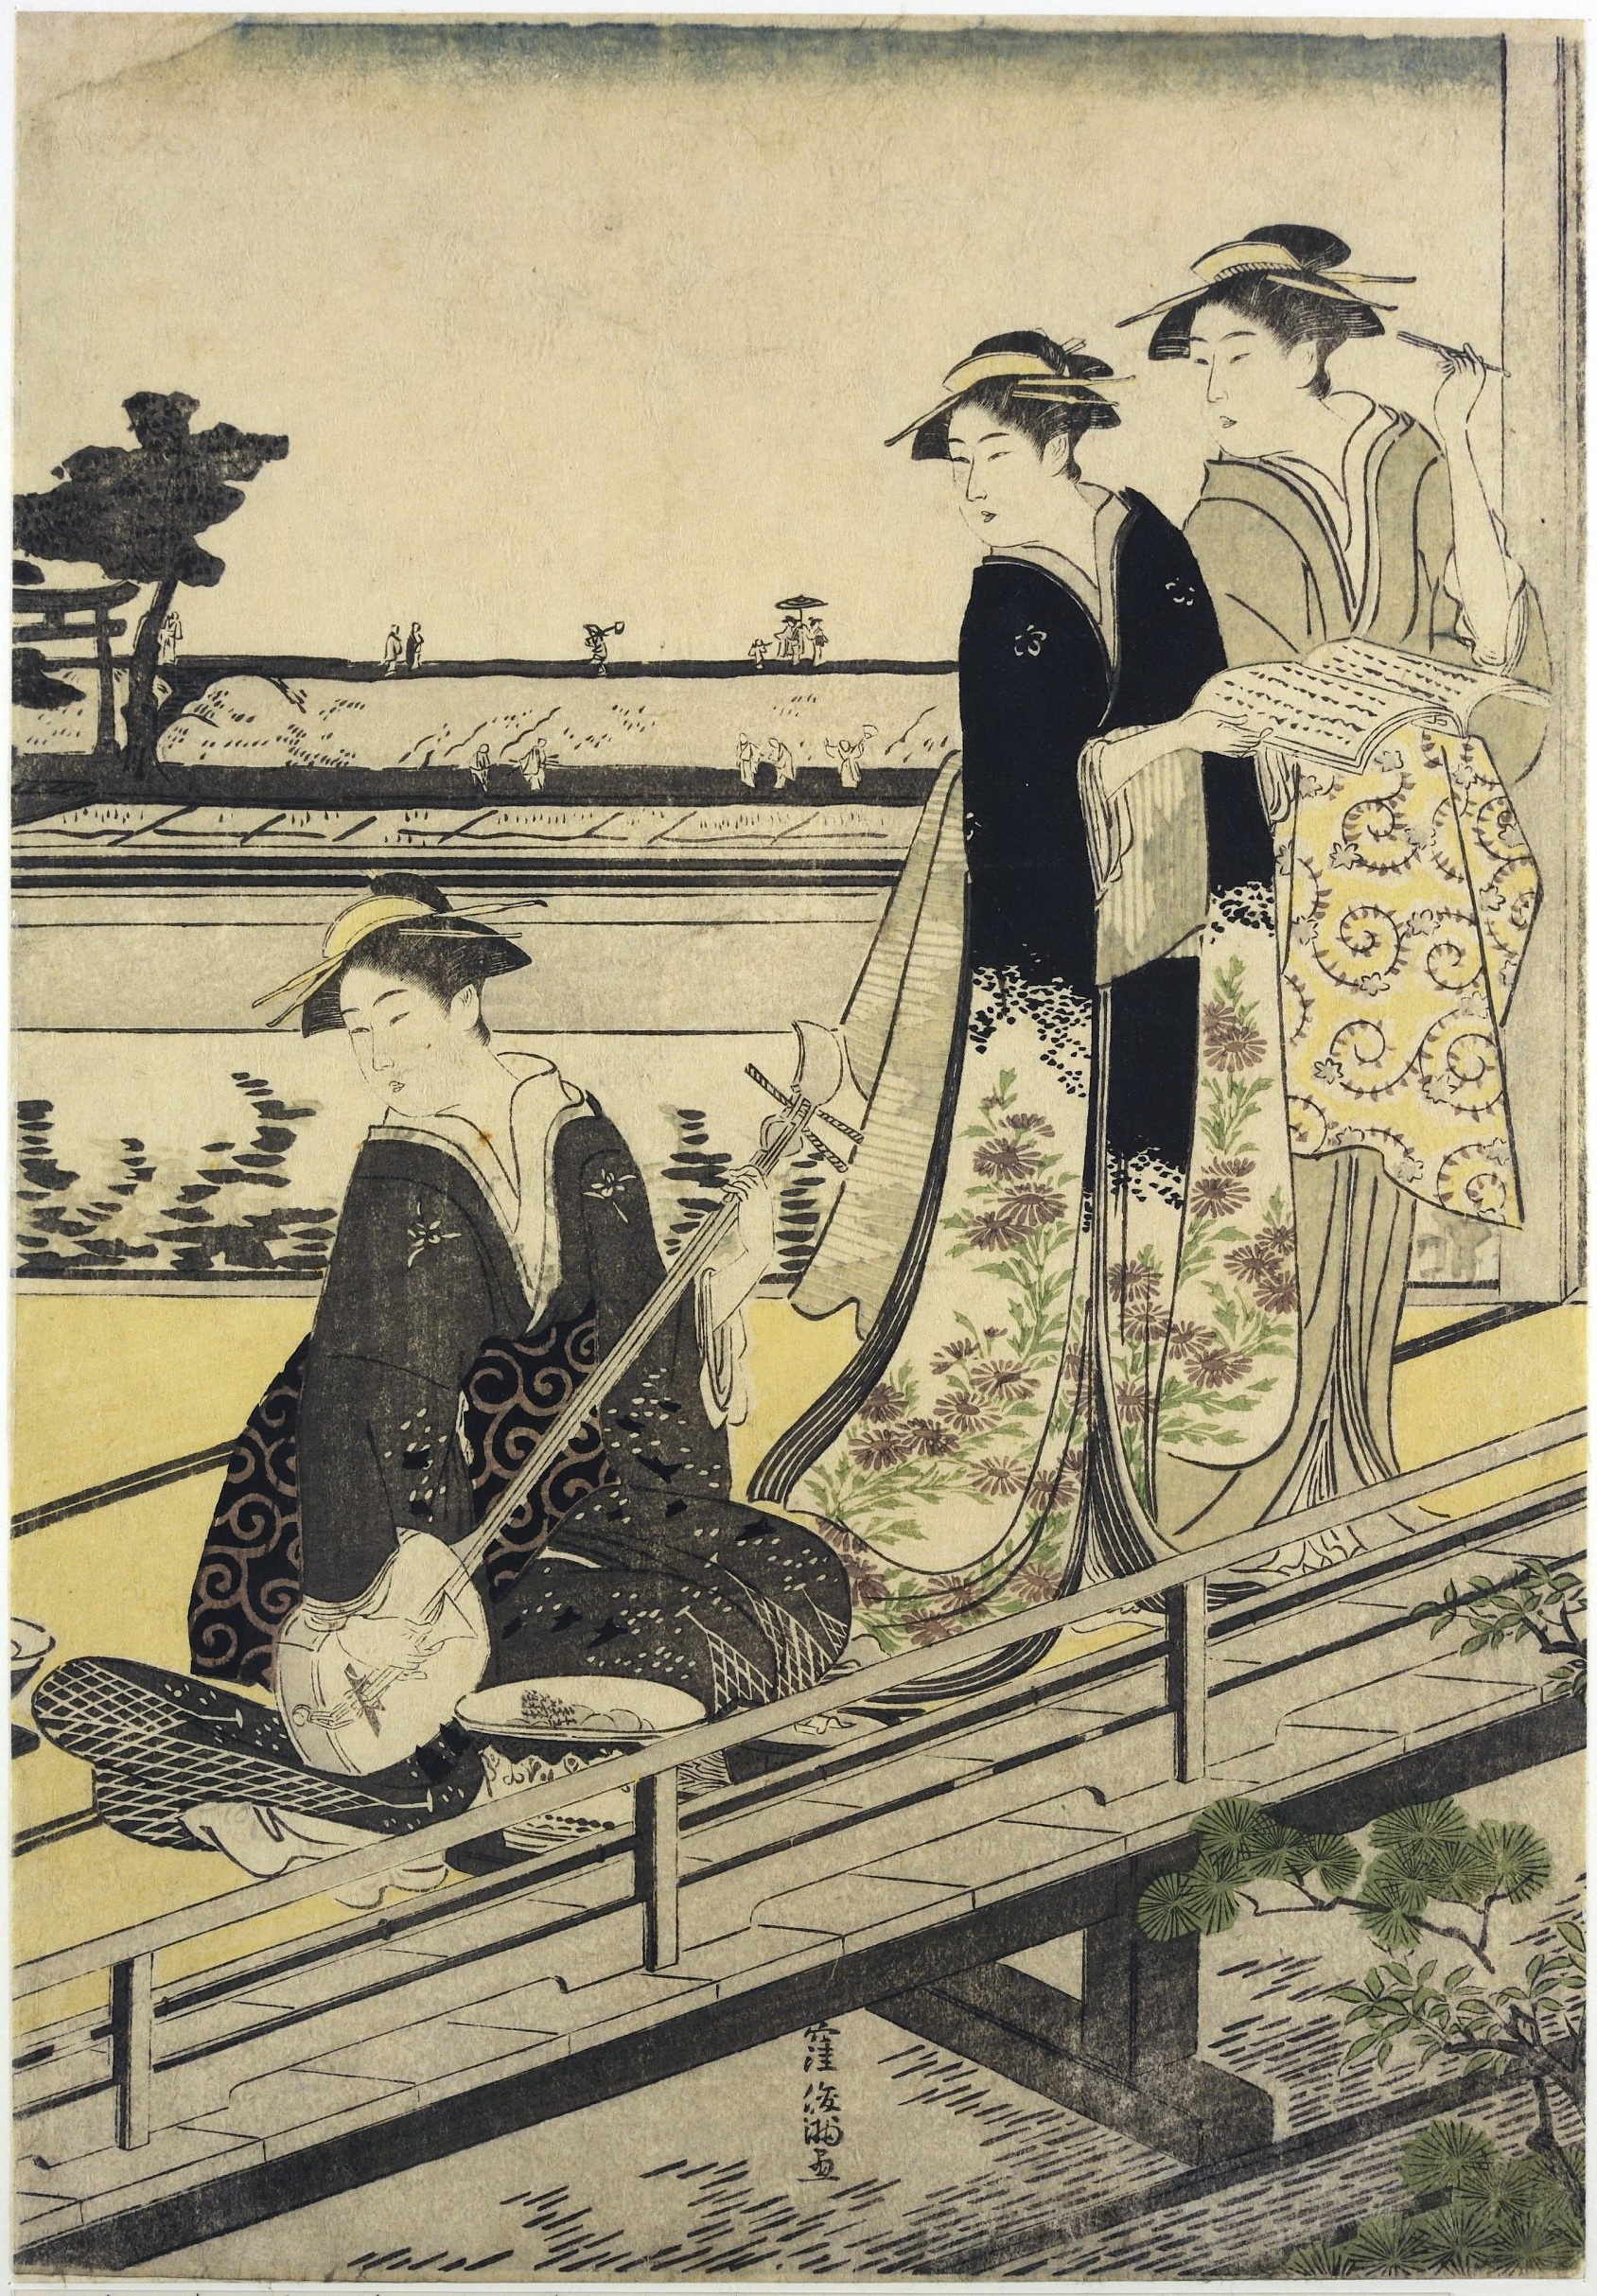 Триптих Сцена в ресторане Накадая в Микодзима_1787-1788_лист 2_320х220 мм